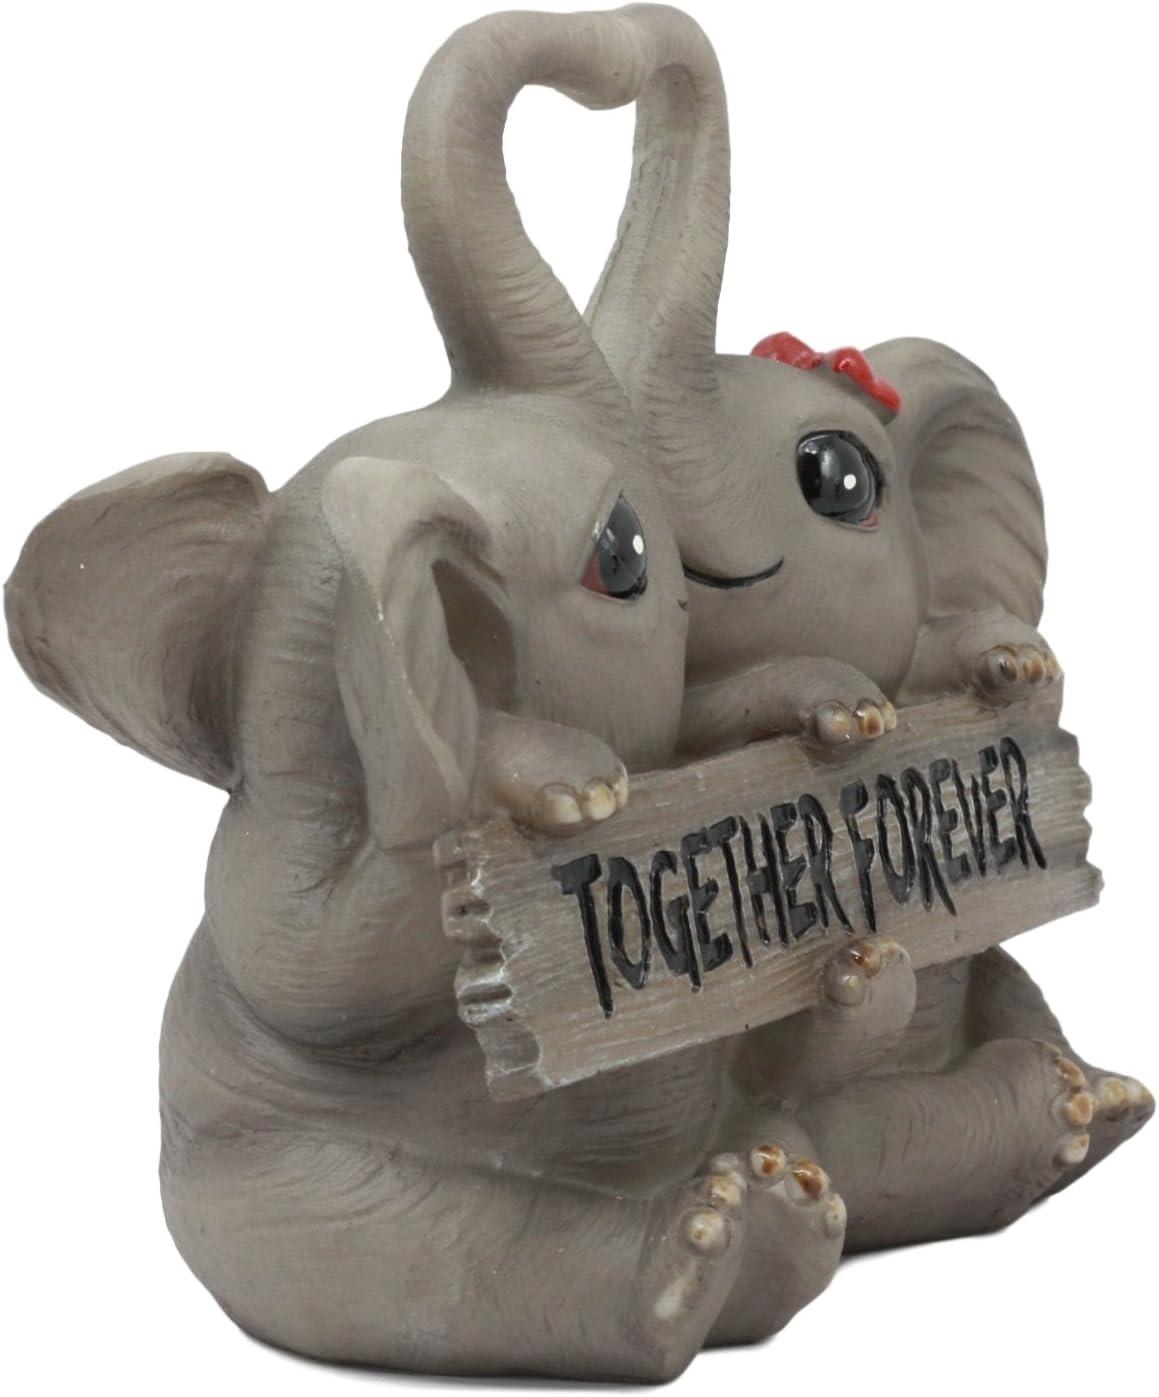 Pair of Entwined Kissing Elephants Elephant Heart Art Figurine Ornament  Gift